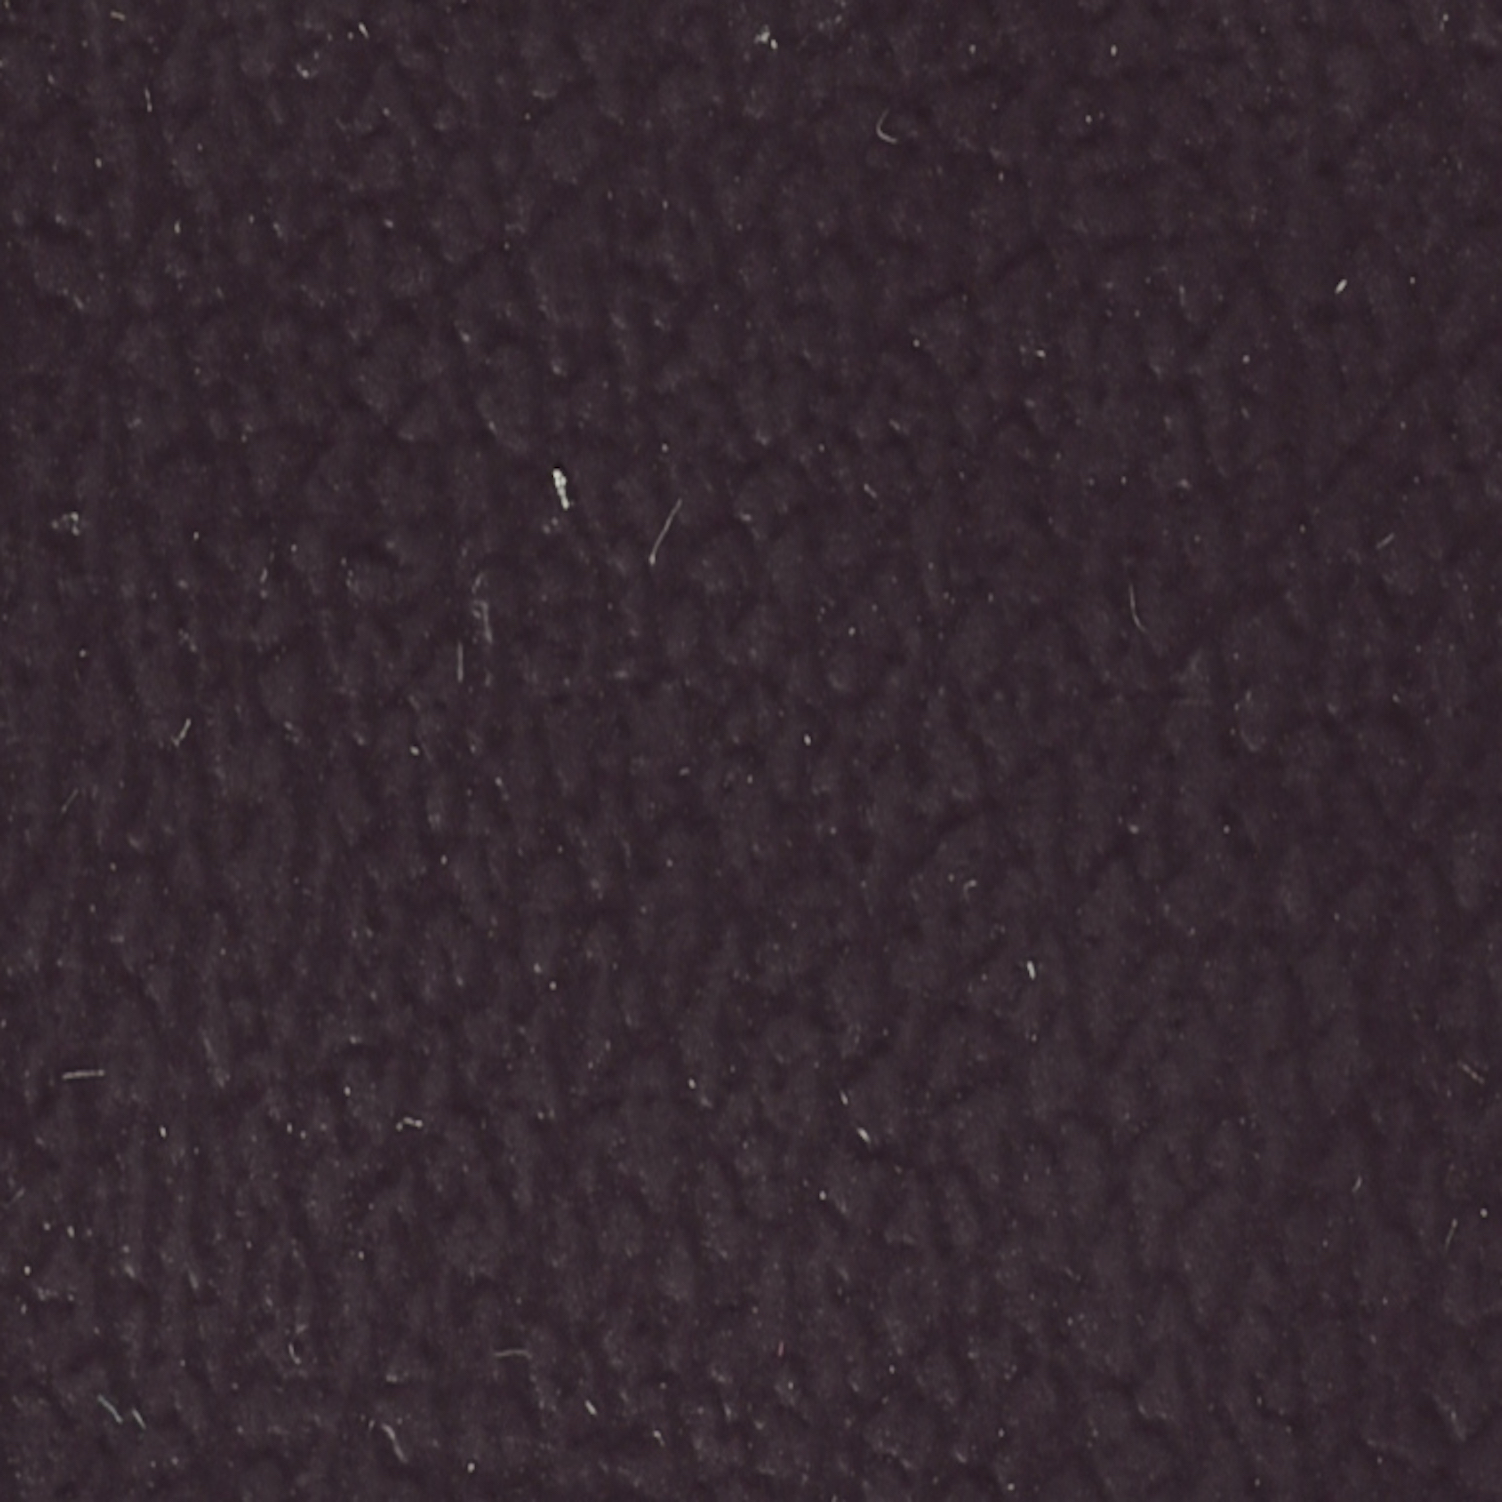 PURPLE GRAY   XL-2084